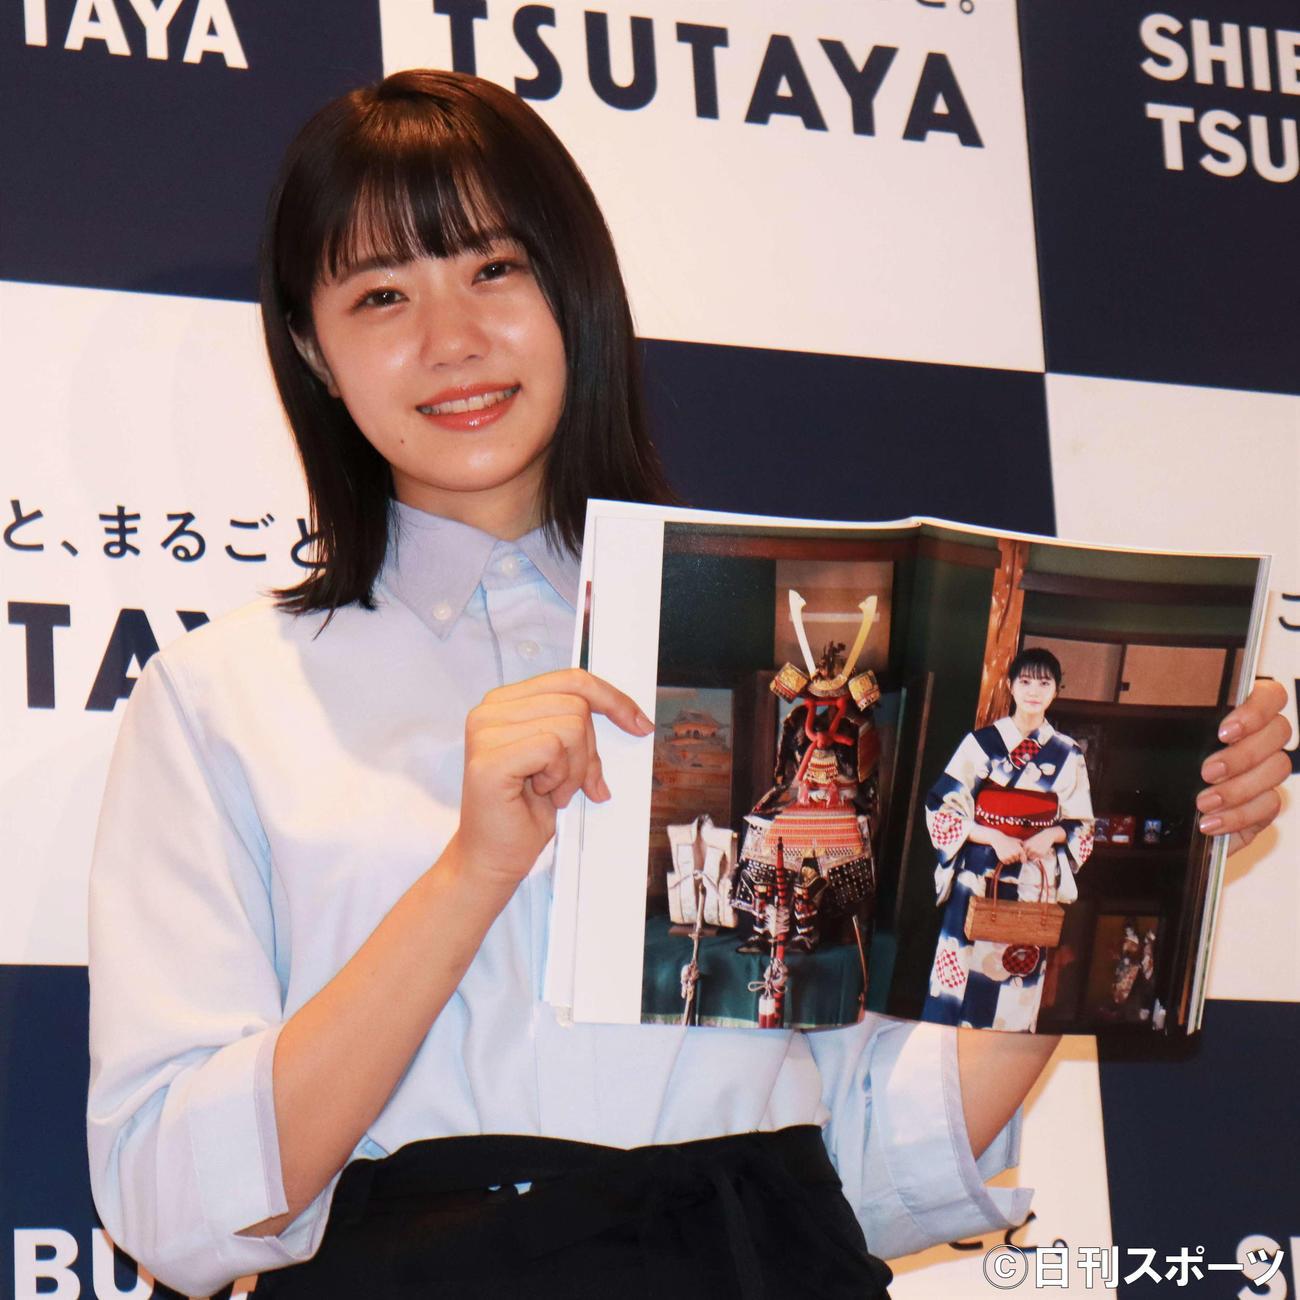 SHIBUYA TSUTAYAの一日店長に就任し、写真集を片手に笑顔の瀧野由美子(撮影・勝部晃多)